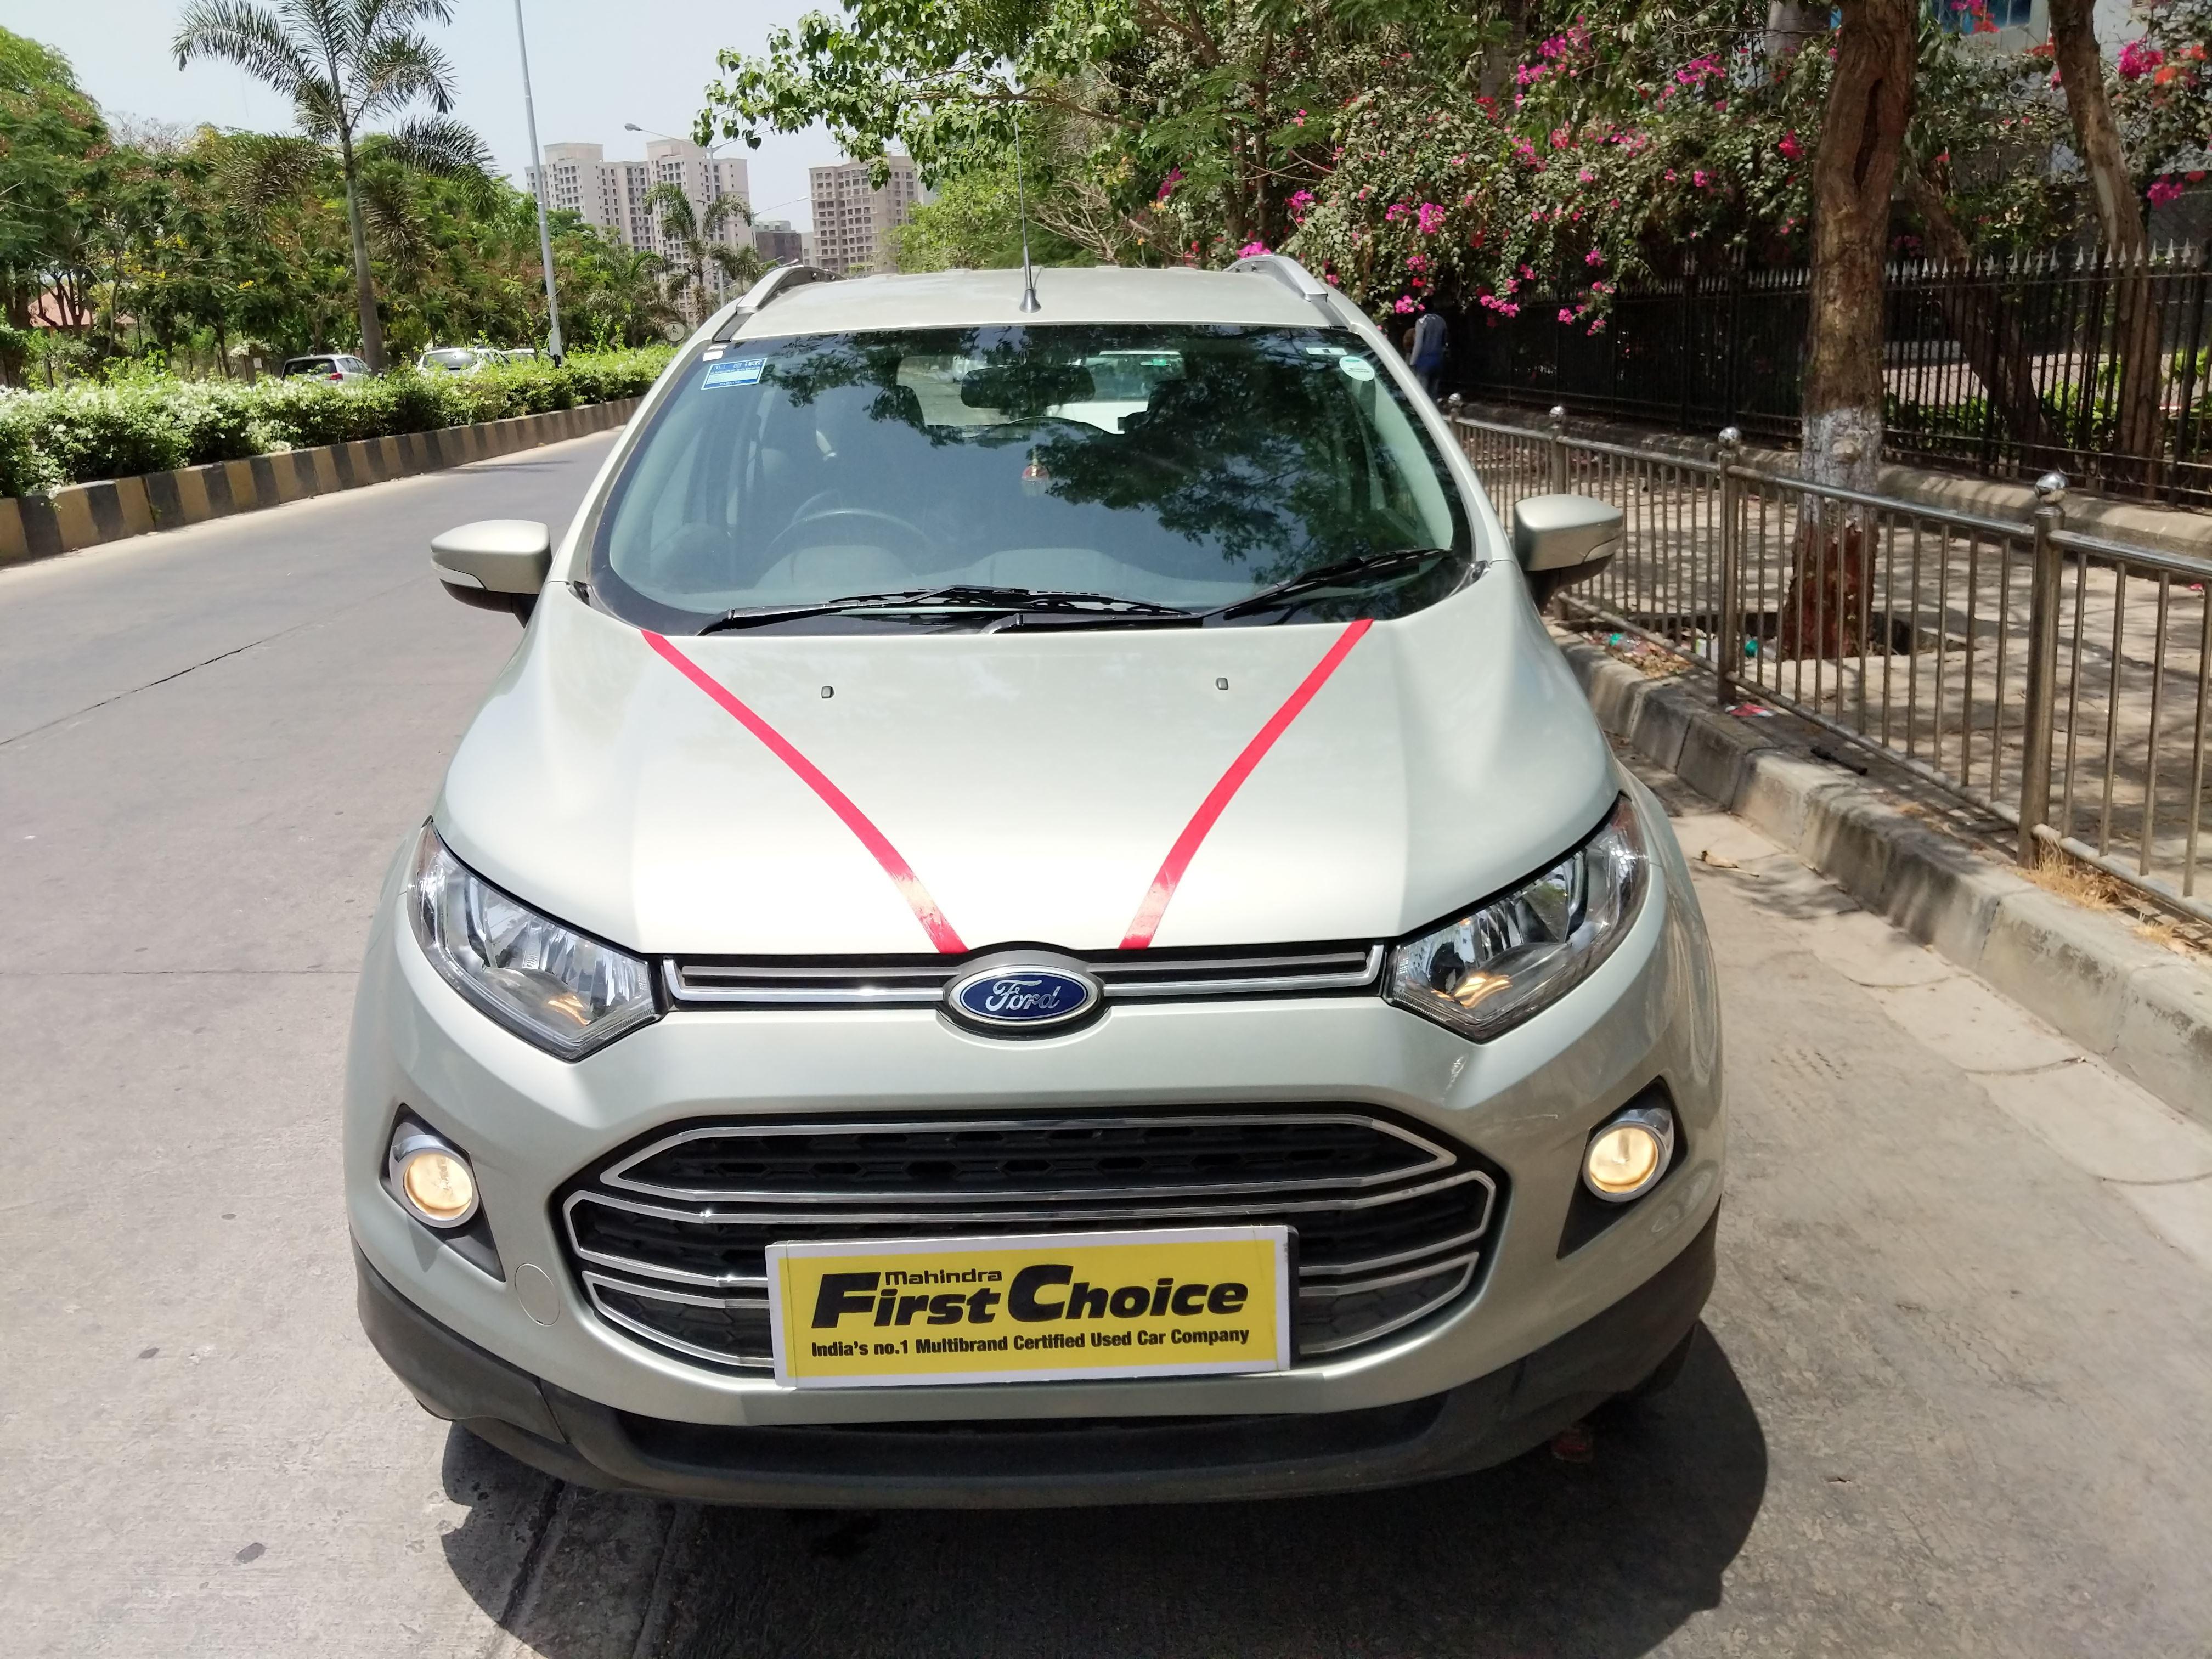 2014 Used Ford Ecosport TITANIUM 1.5 TI VCT